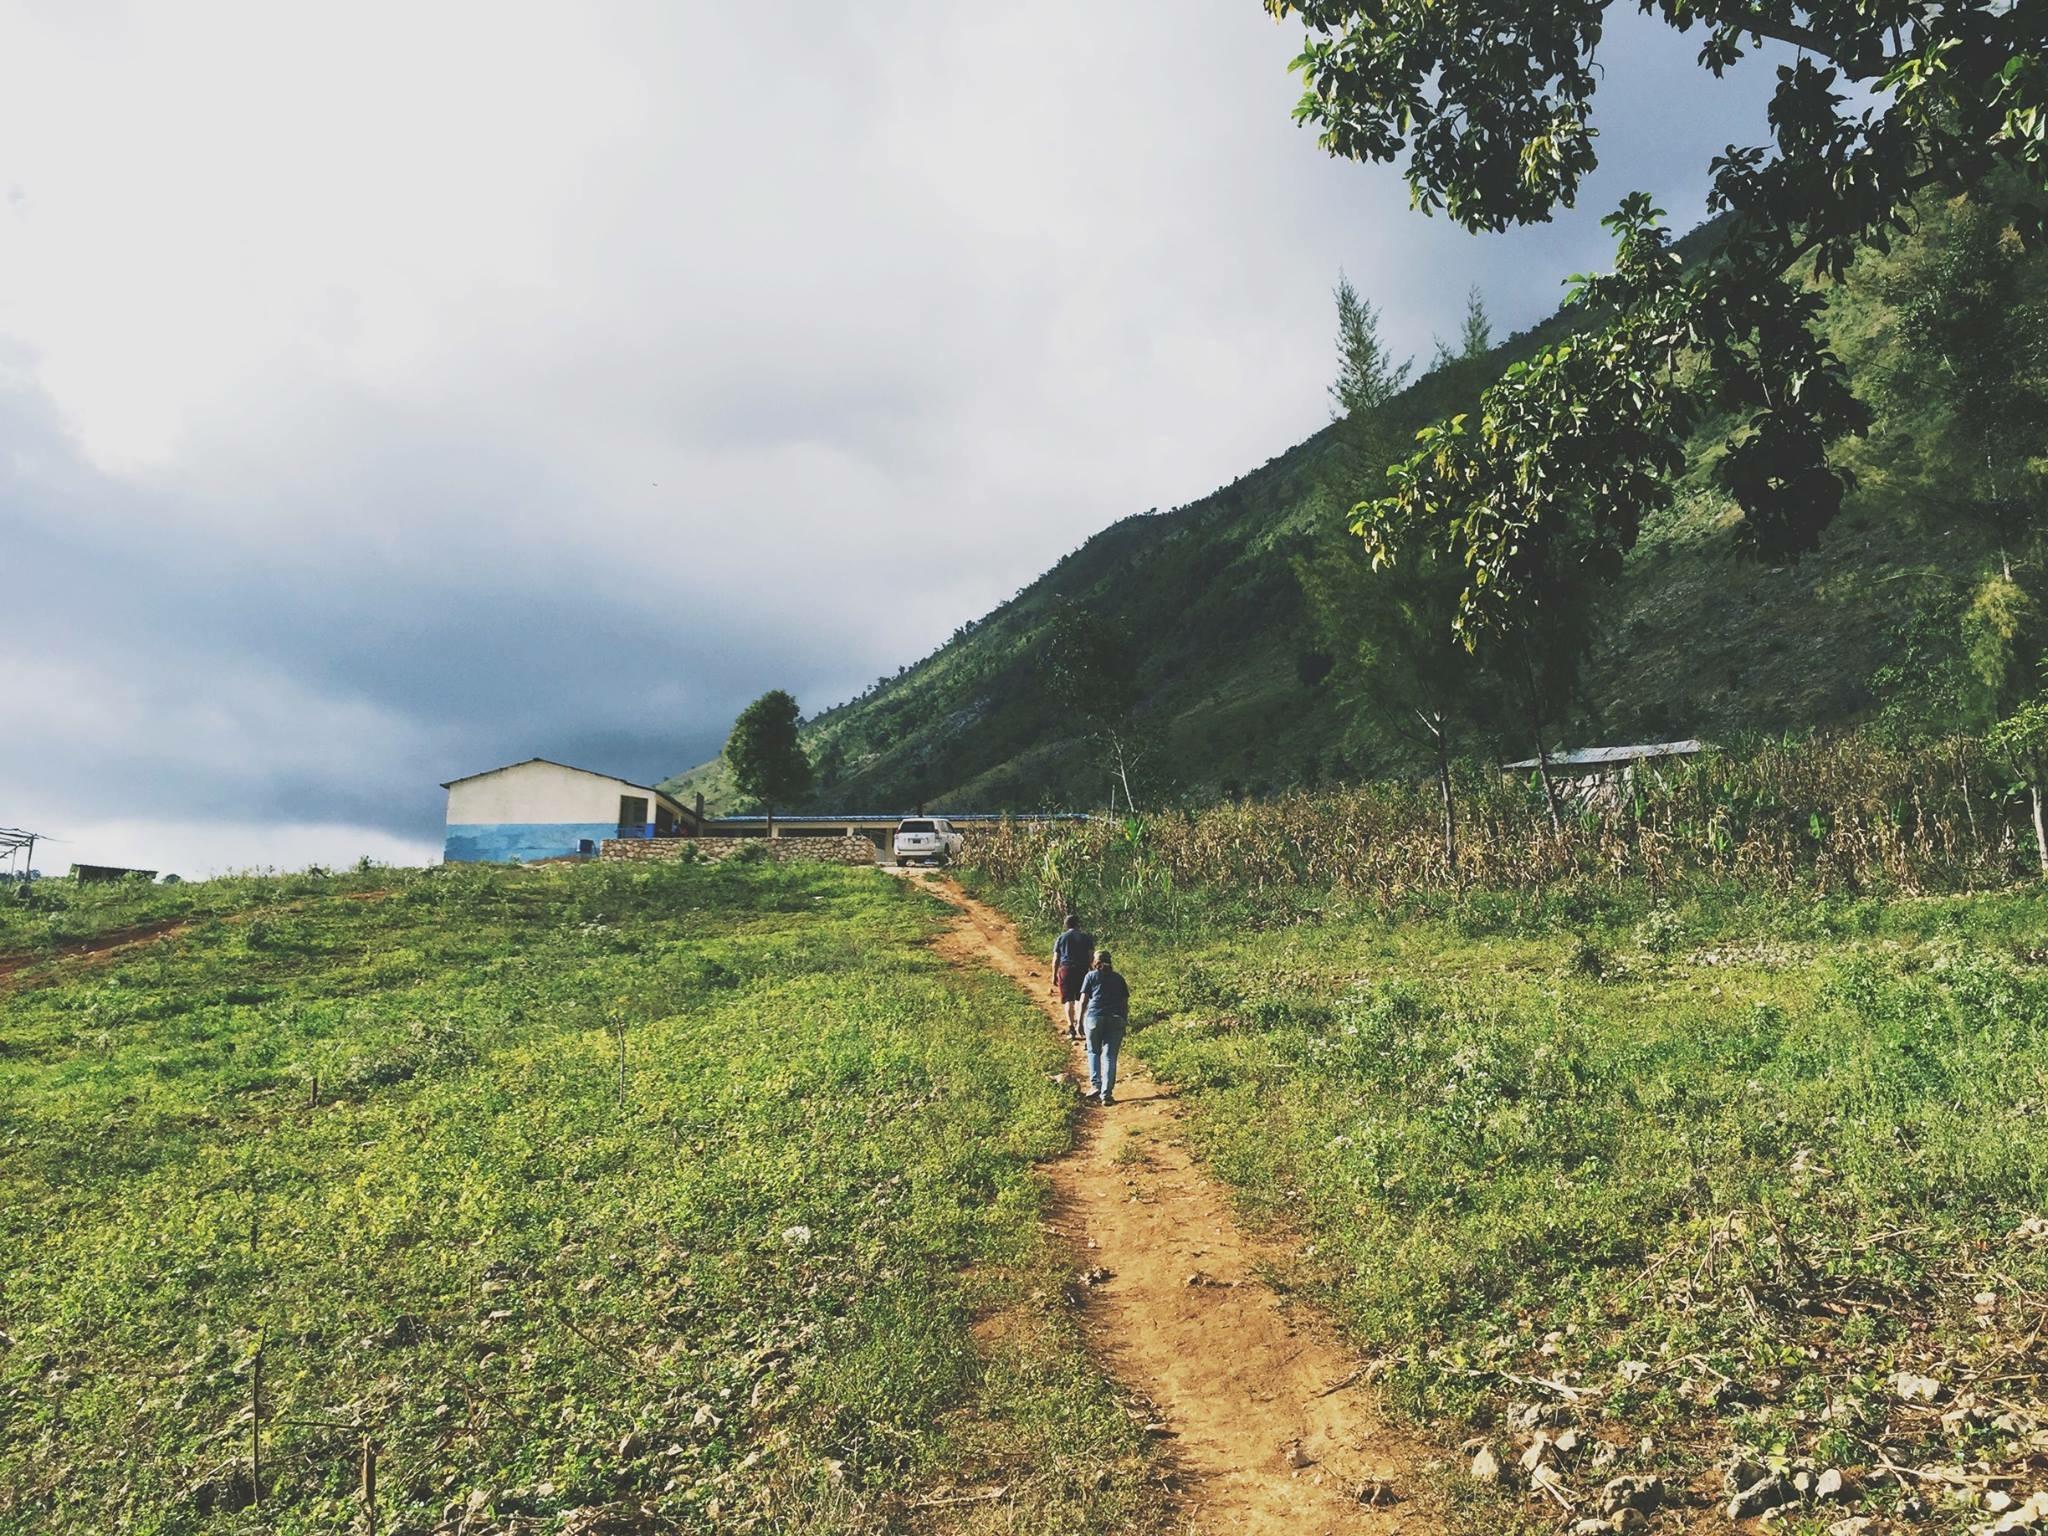 haiti-field-quincy